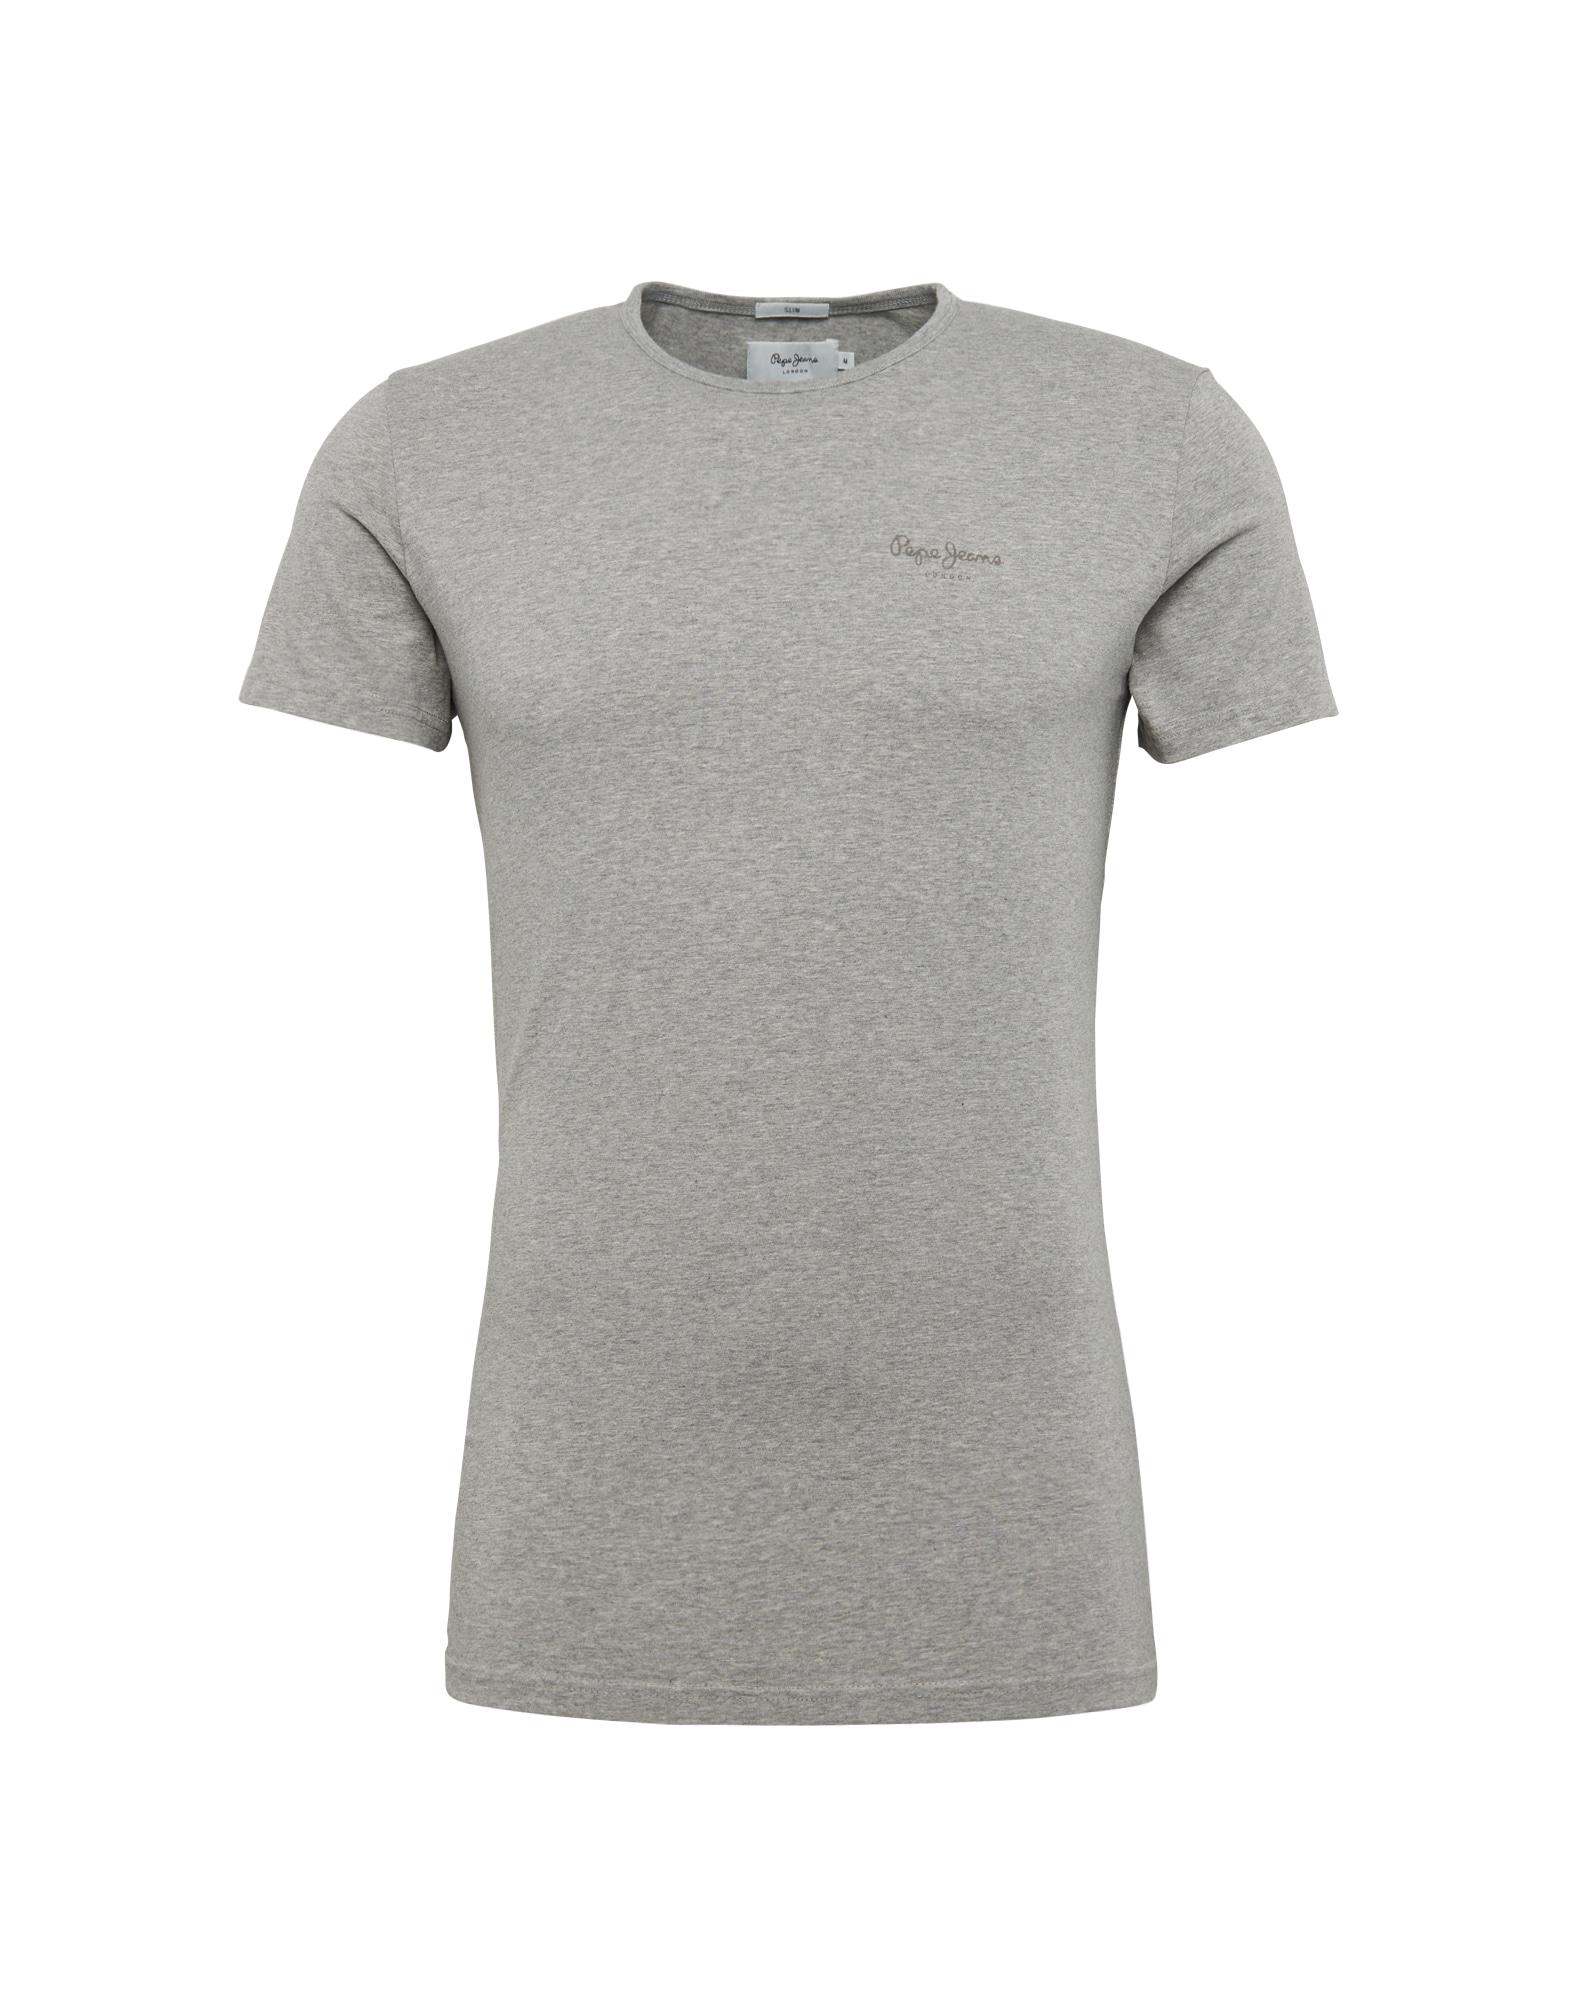 Pepe Jeans Heren Shirt ORIGINAL BASIC S S grijs gemêleerd